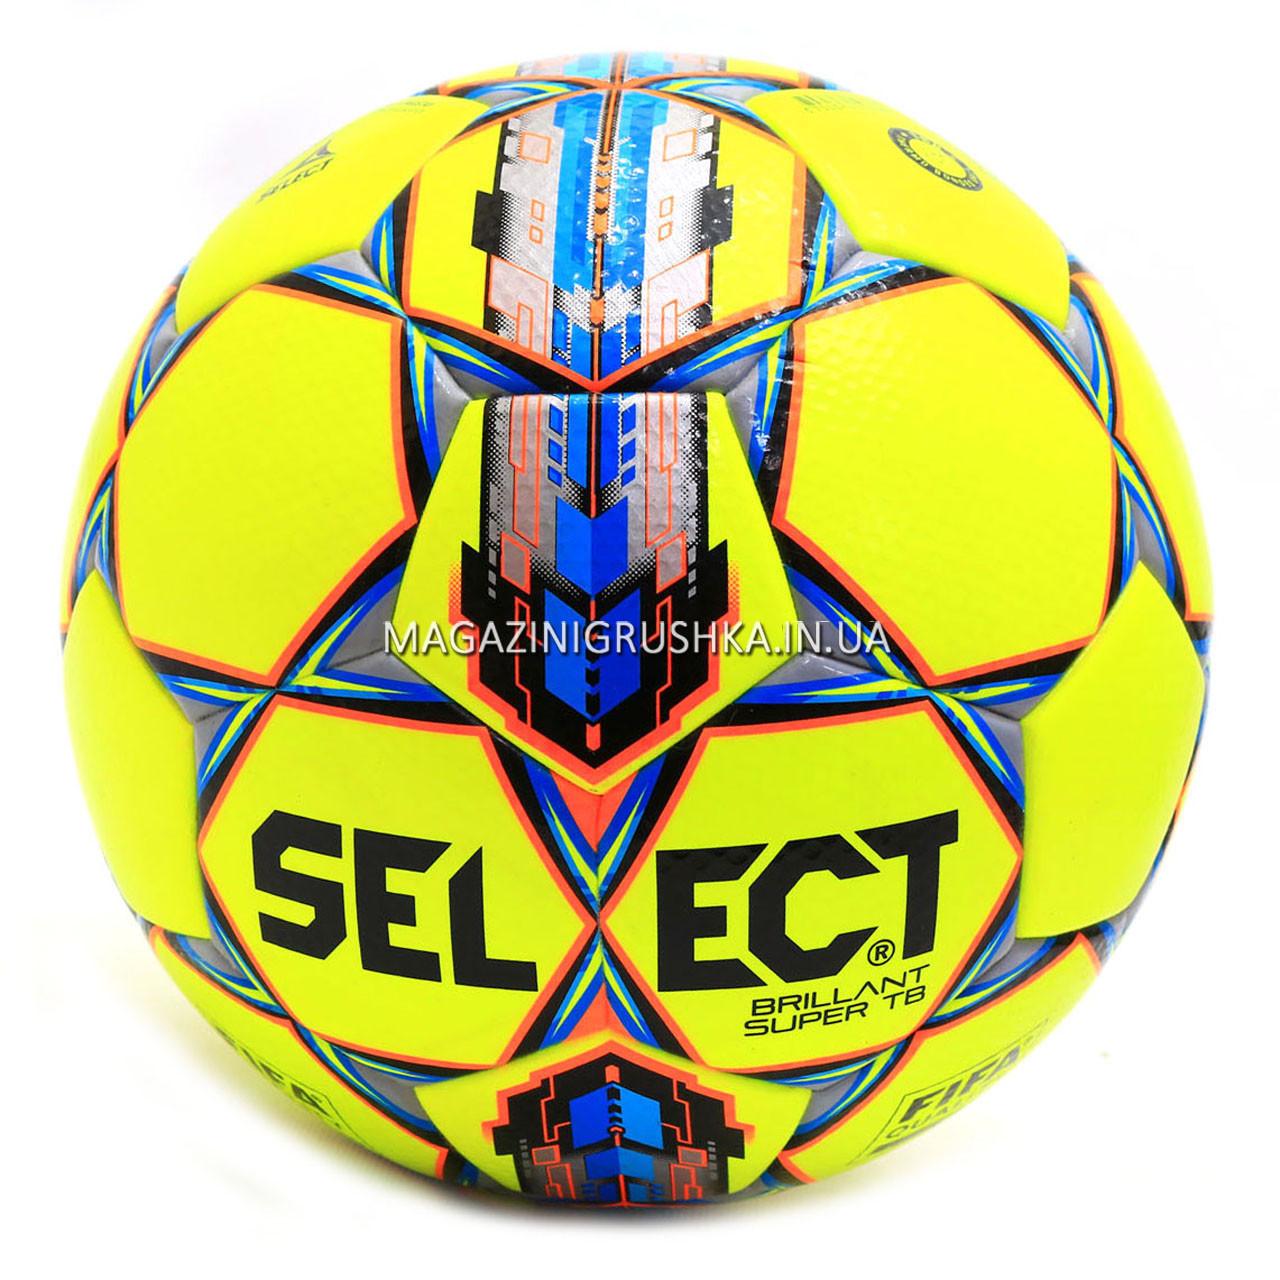 М'яч футбольний SELECT Brillant Super TB (FIFA QUALITY PRO) жовтий